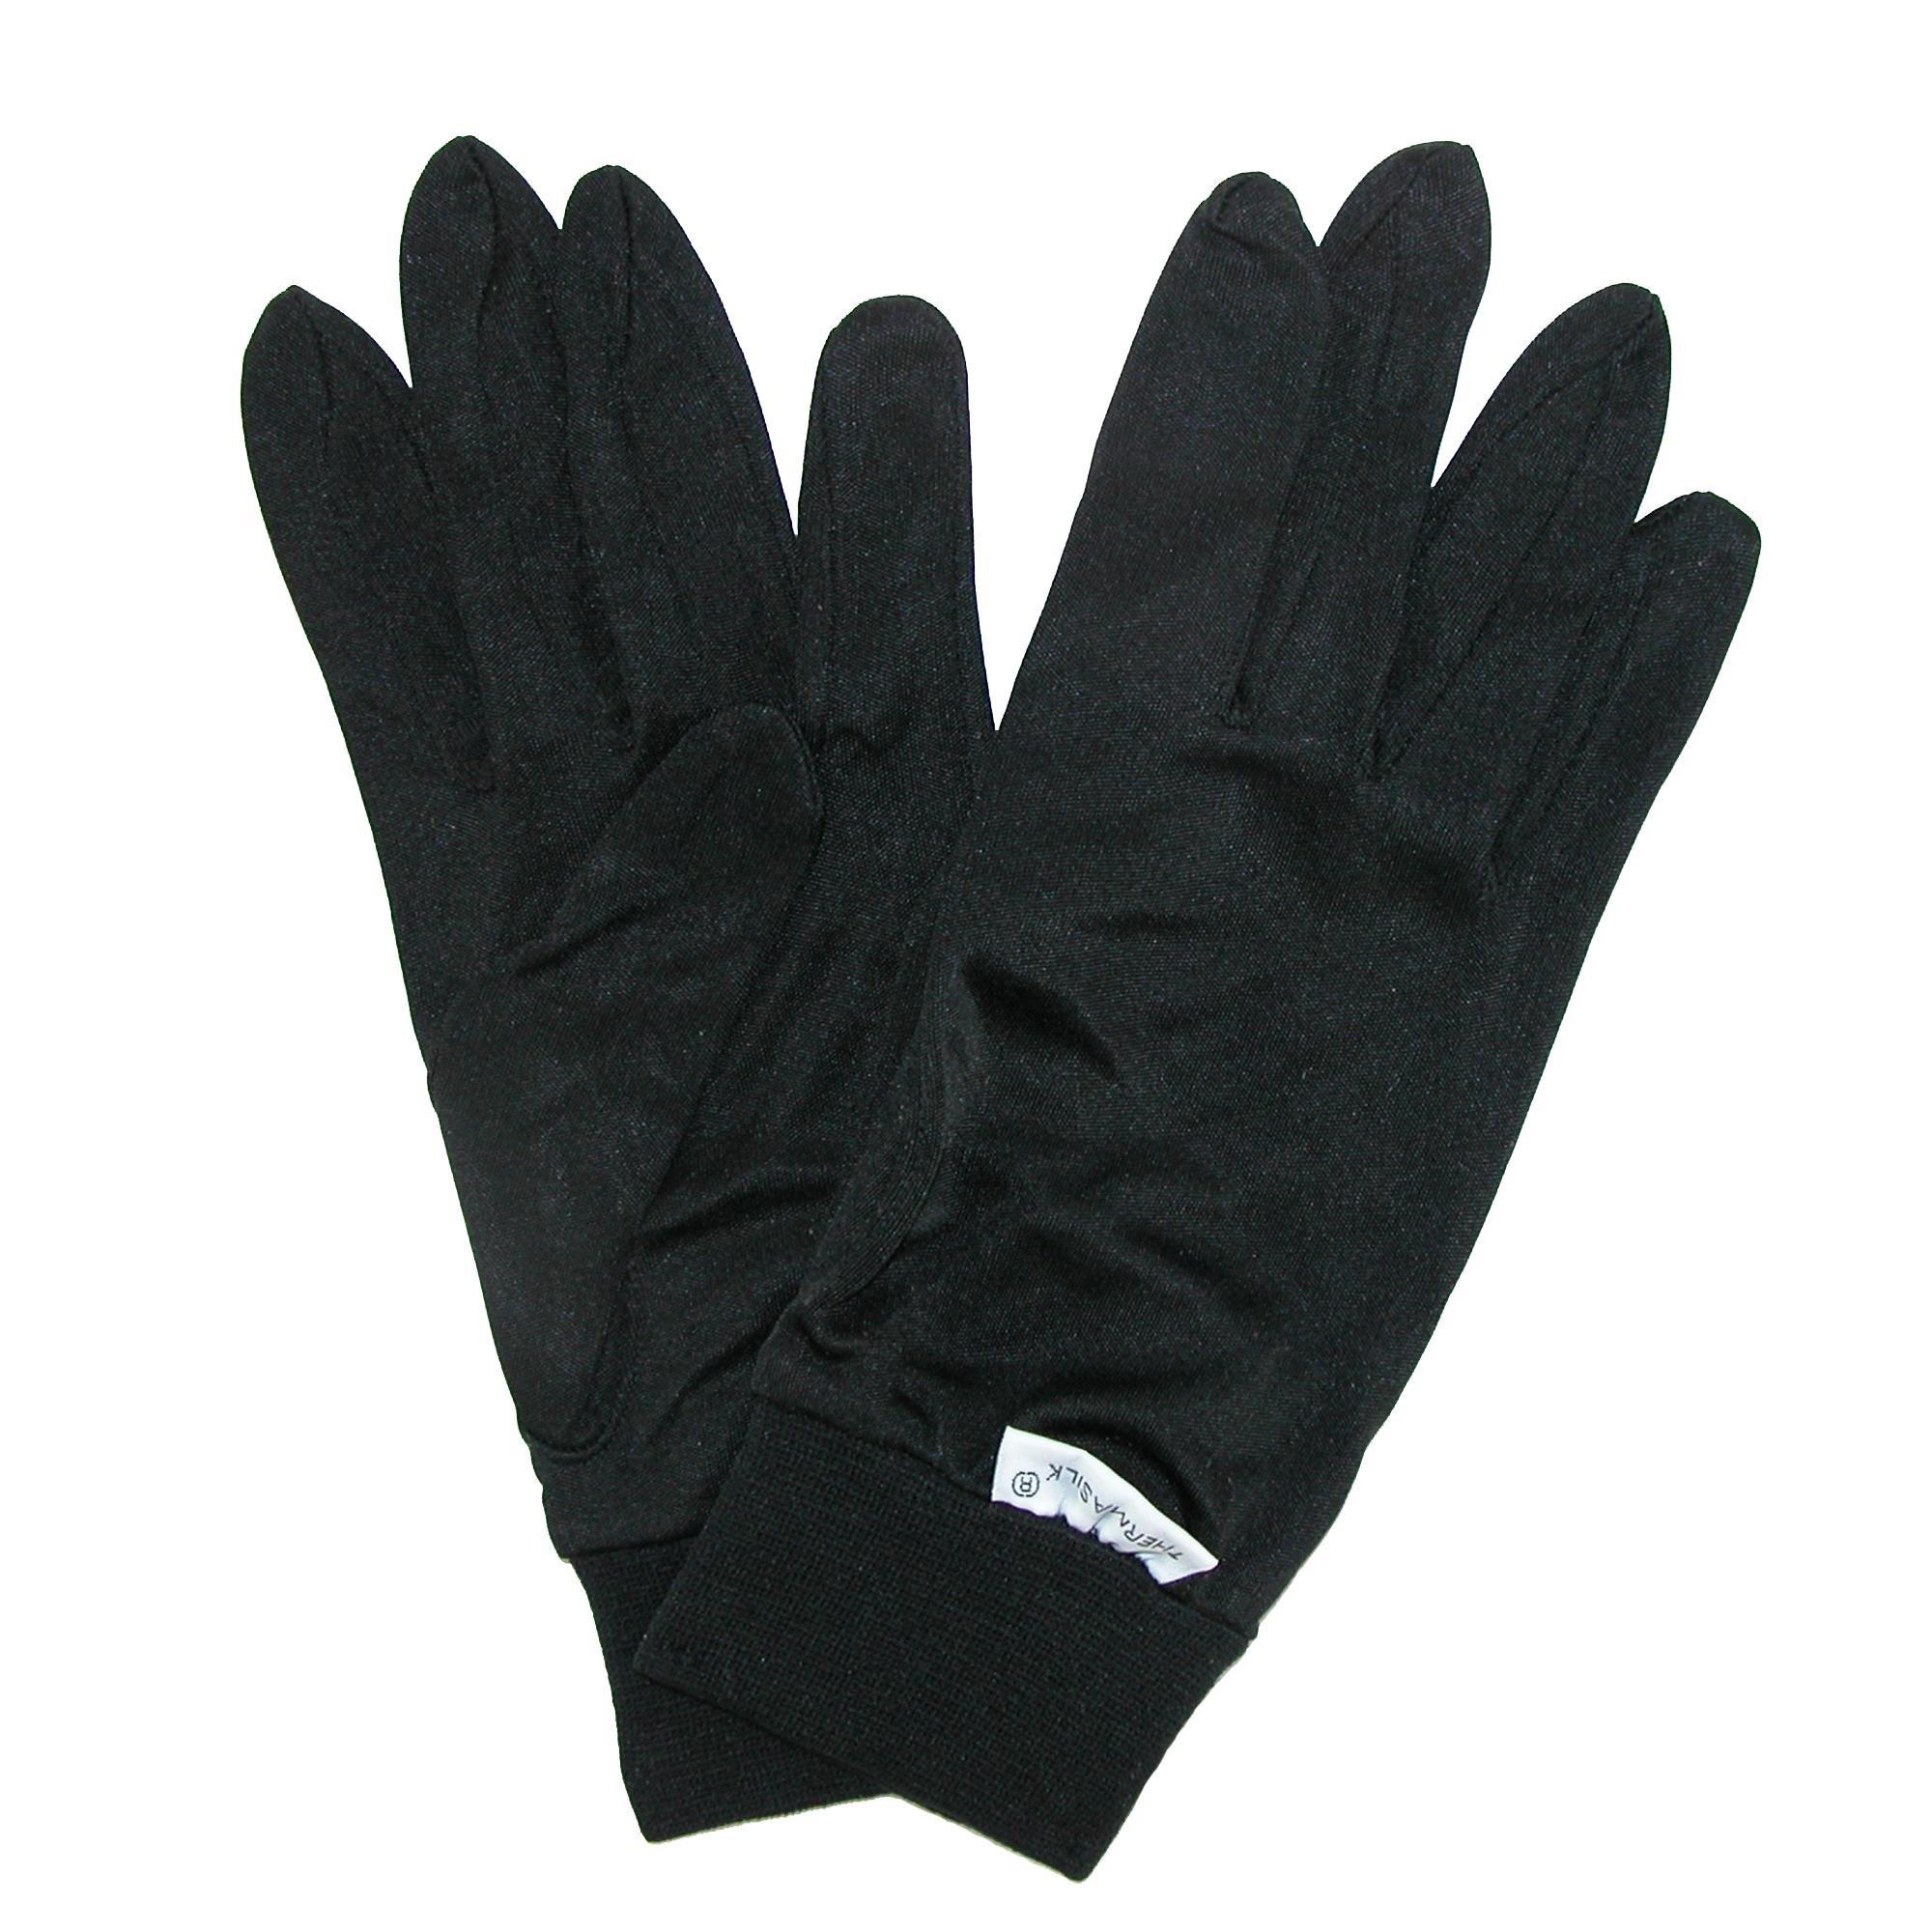 Terramar Kids Thermasilk Ultra-Thin Performance Liner Gloves, Black, Medium (6)